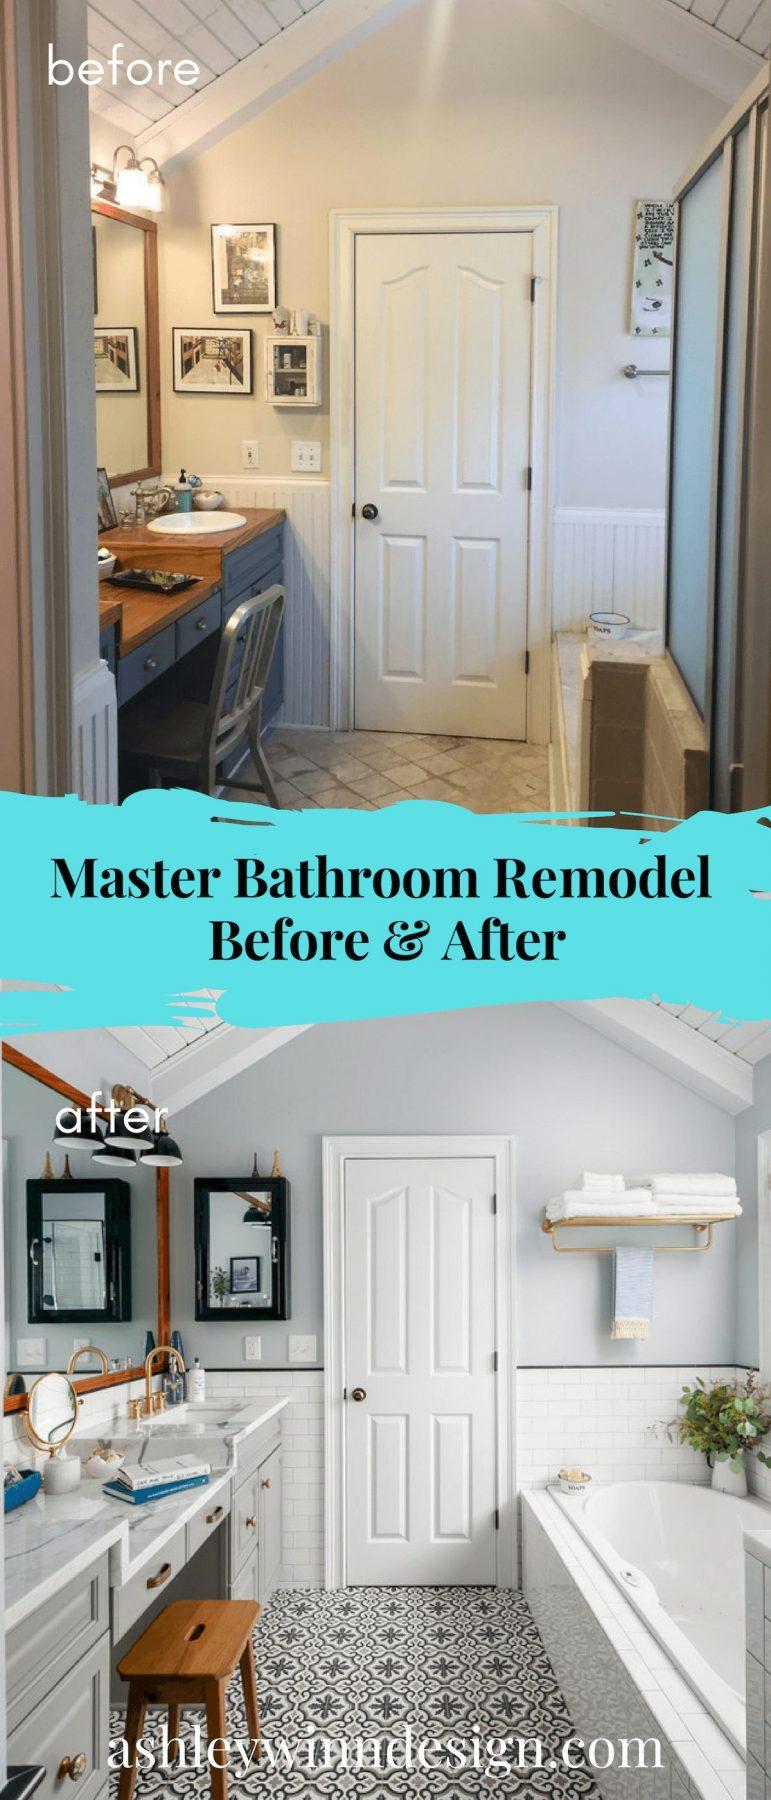 bathroom remodel contractors near me